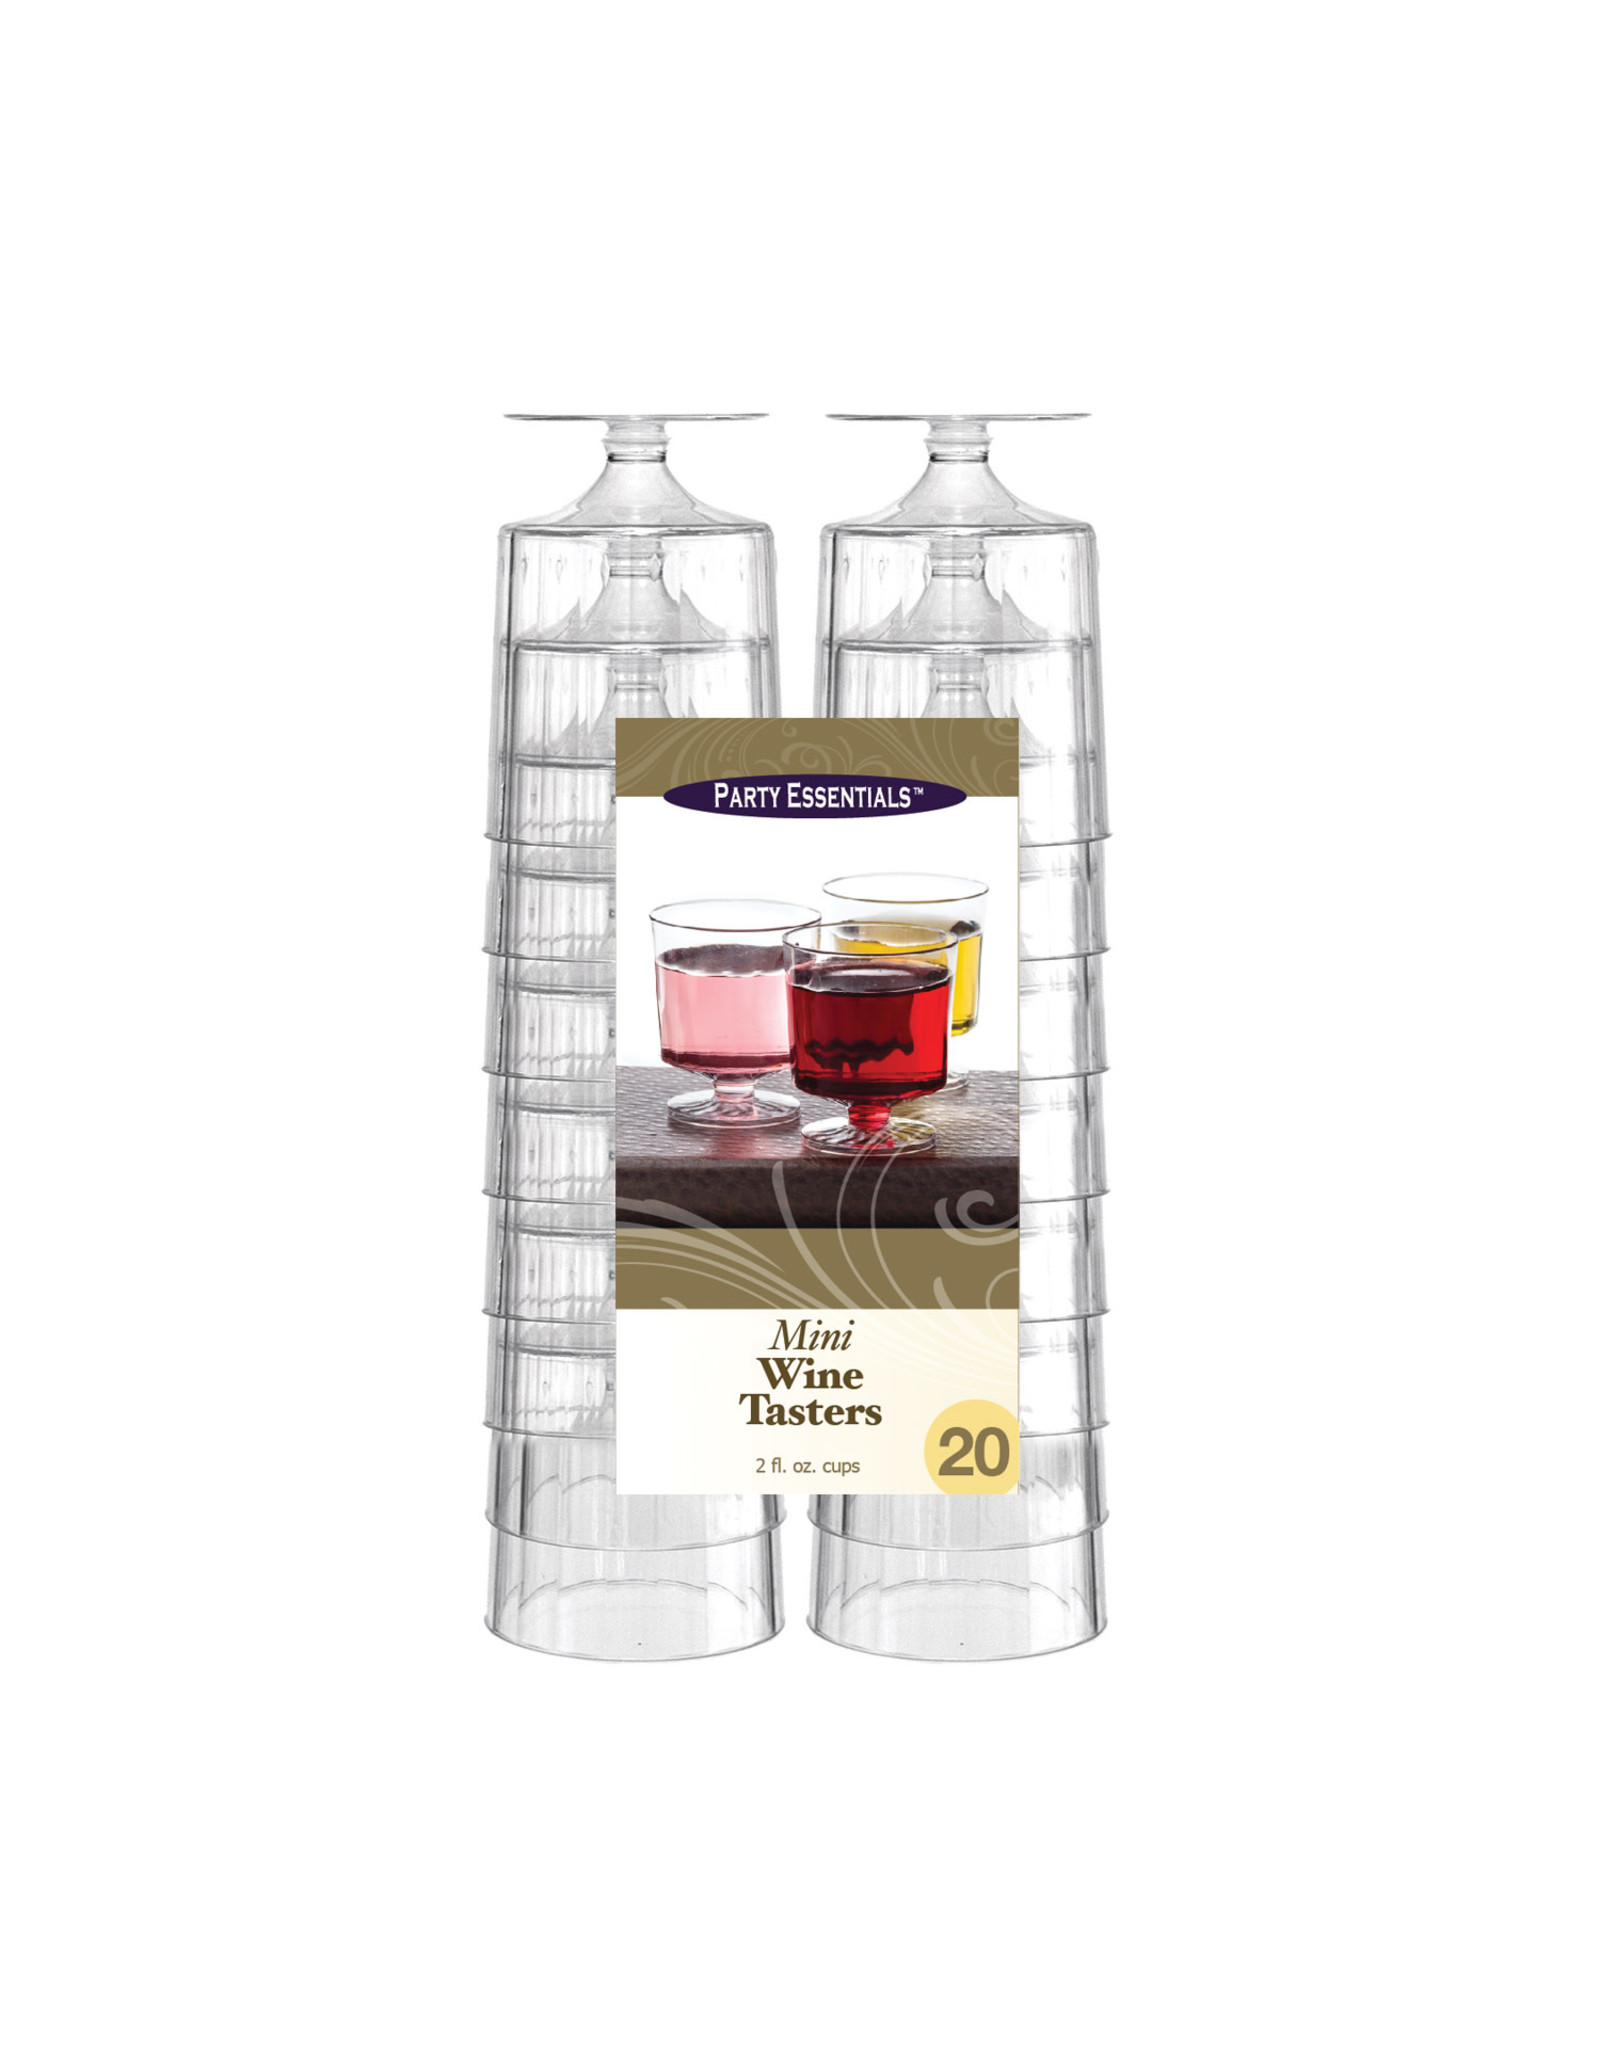 Party Essentials 2oz. Mini Wine Tasters - 20ct.